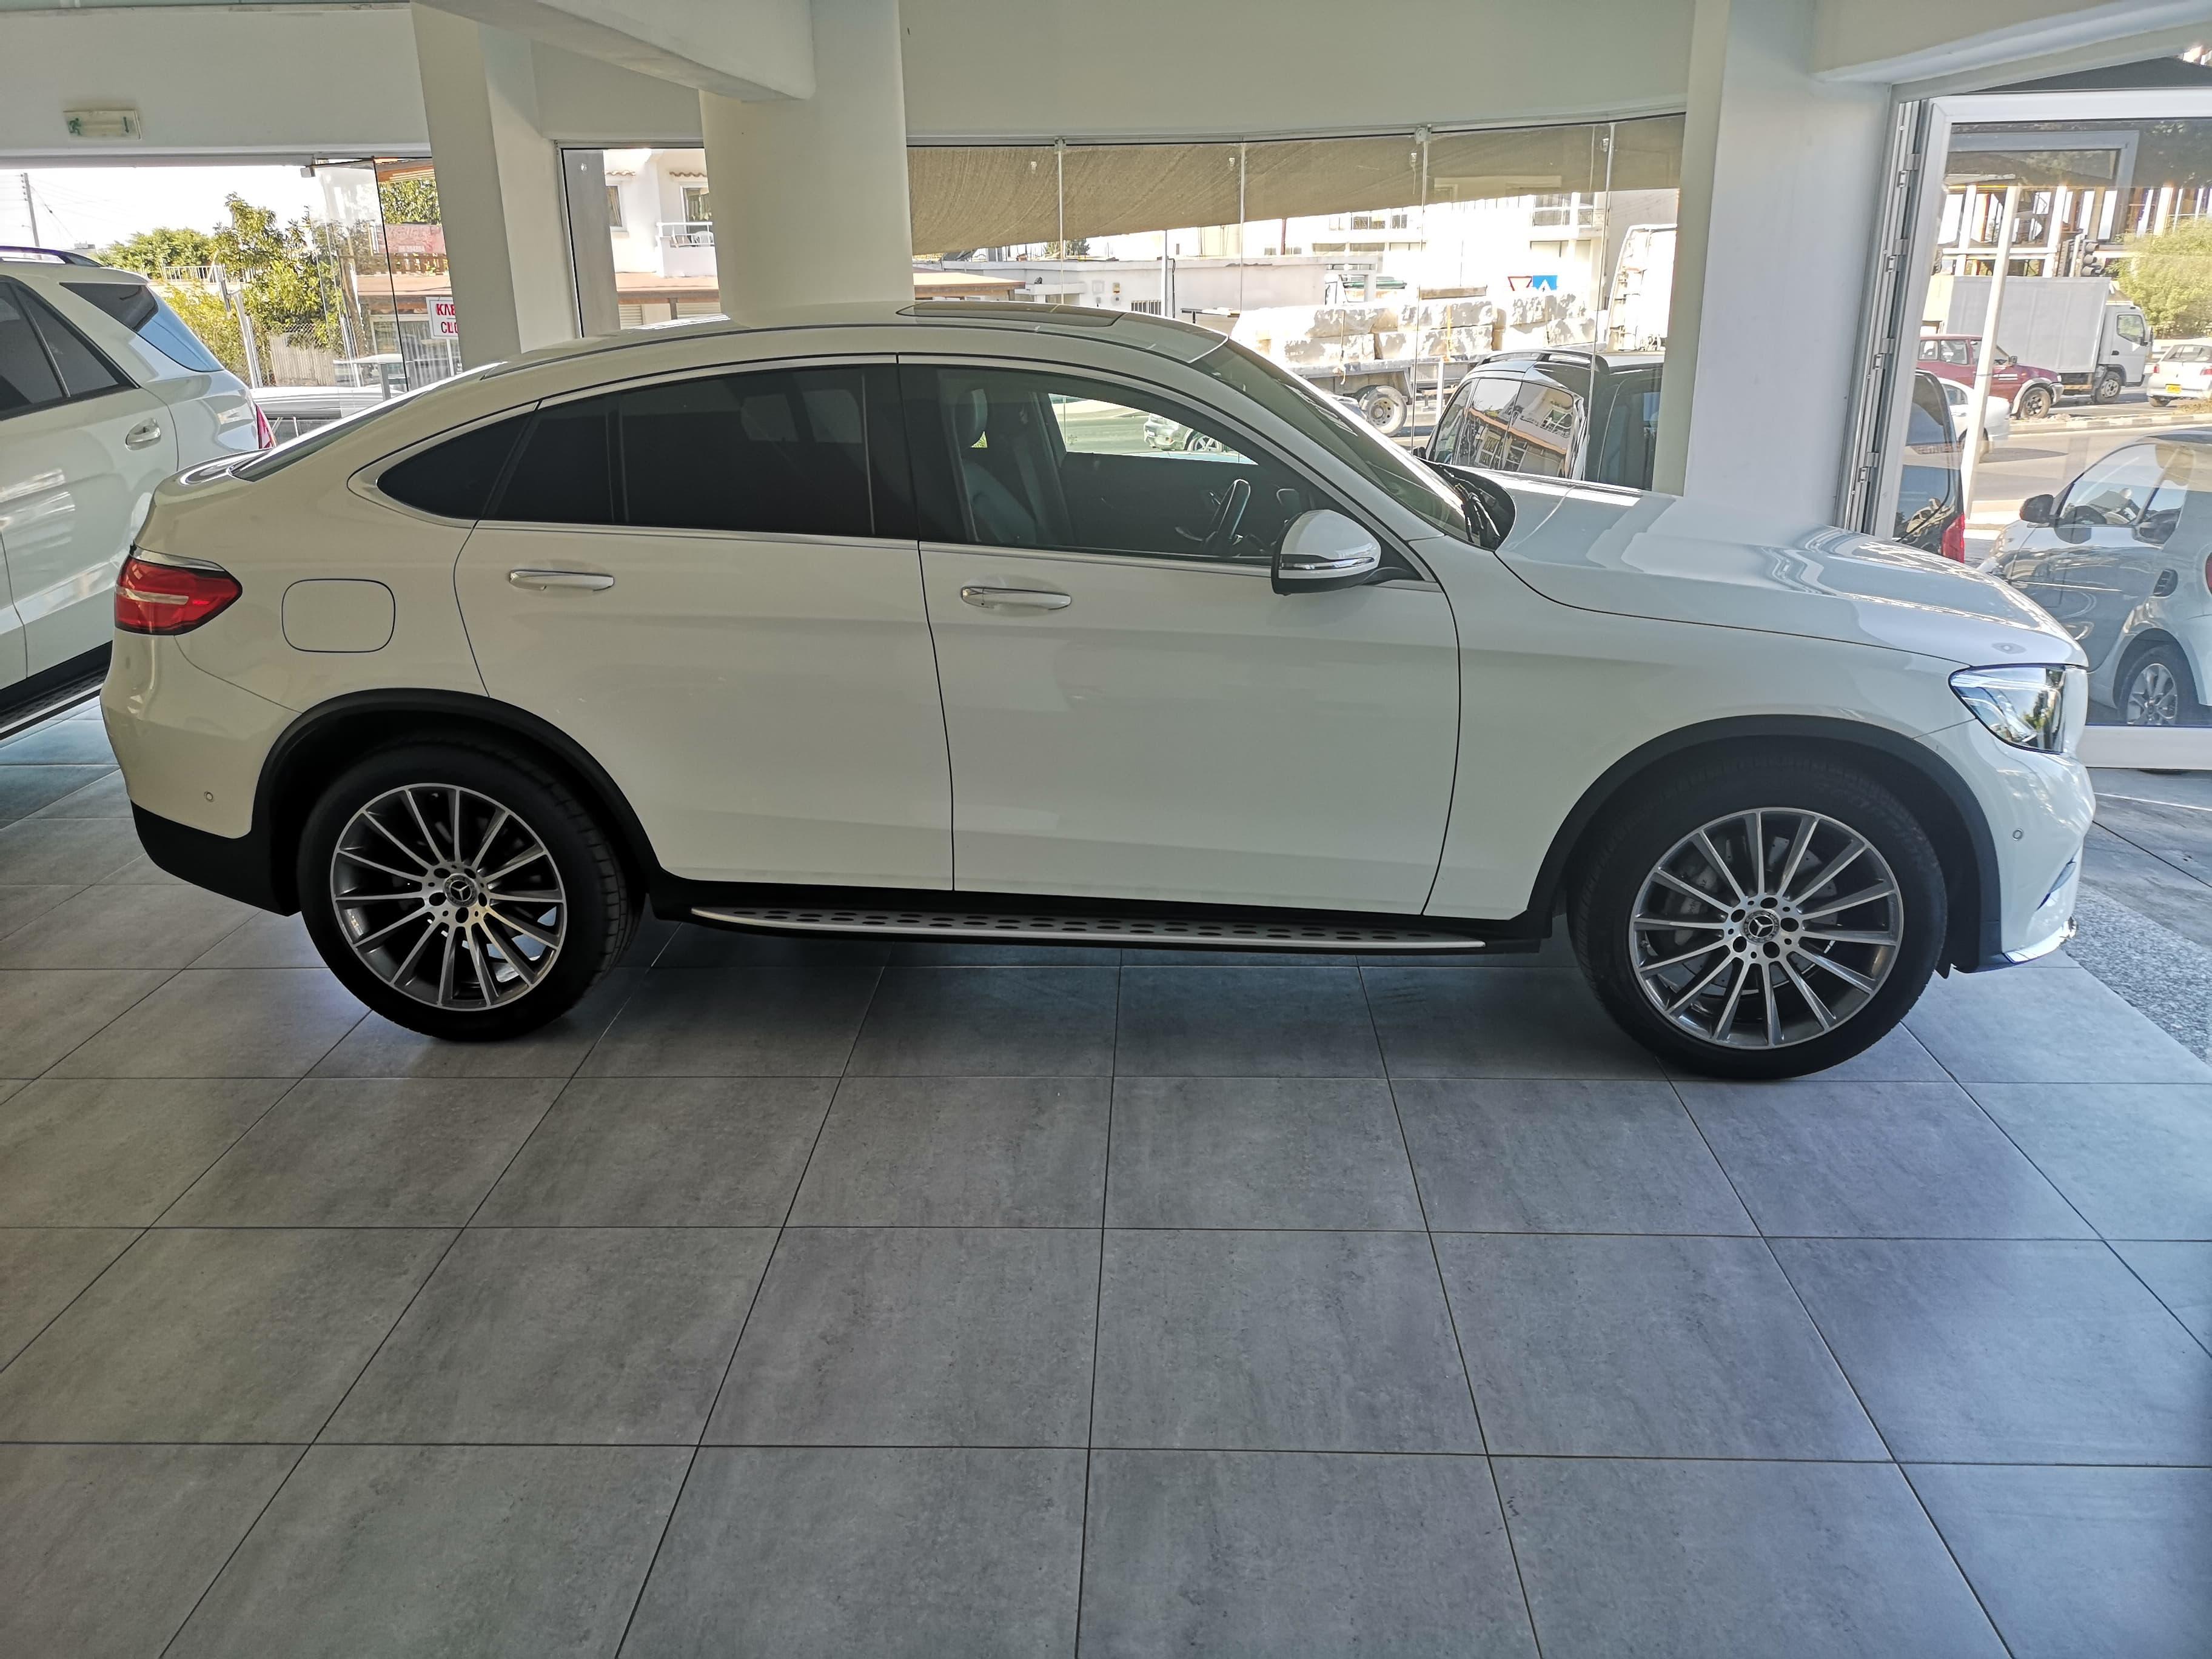 Mercedes Benz GLC 250 Premium